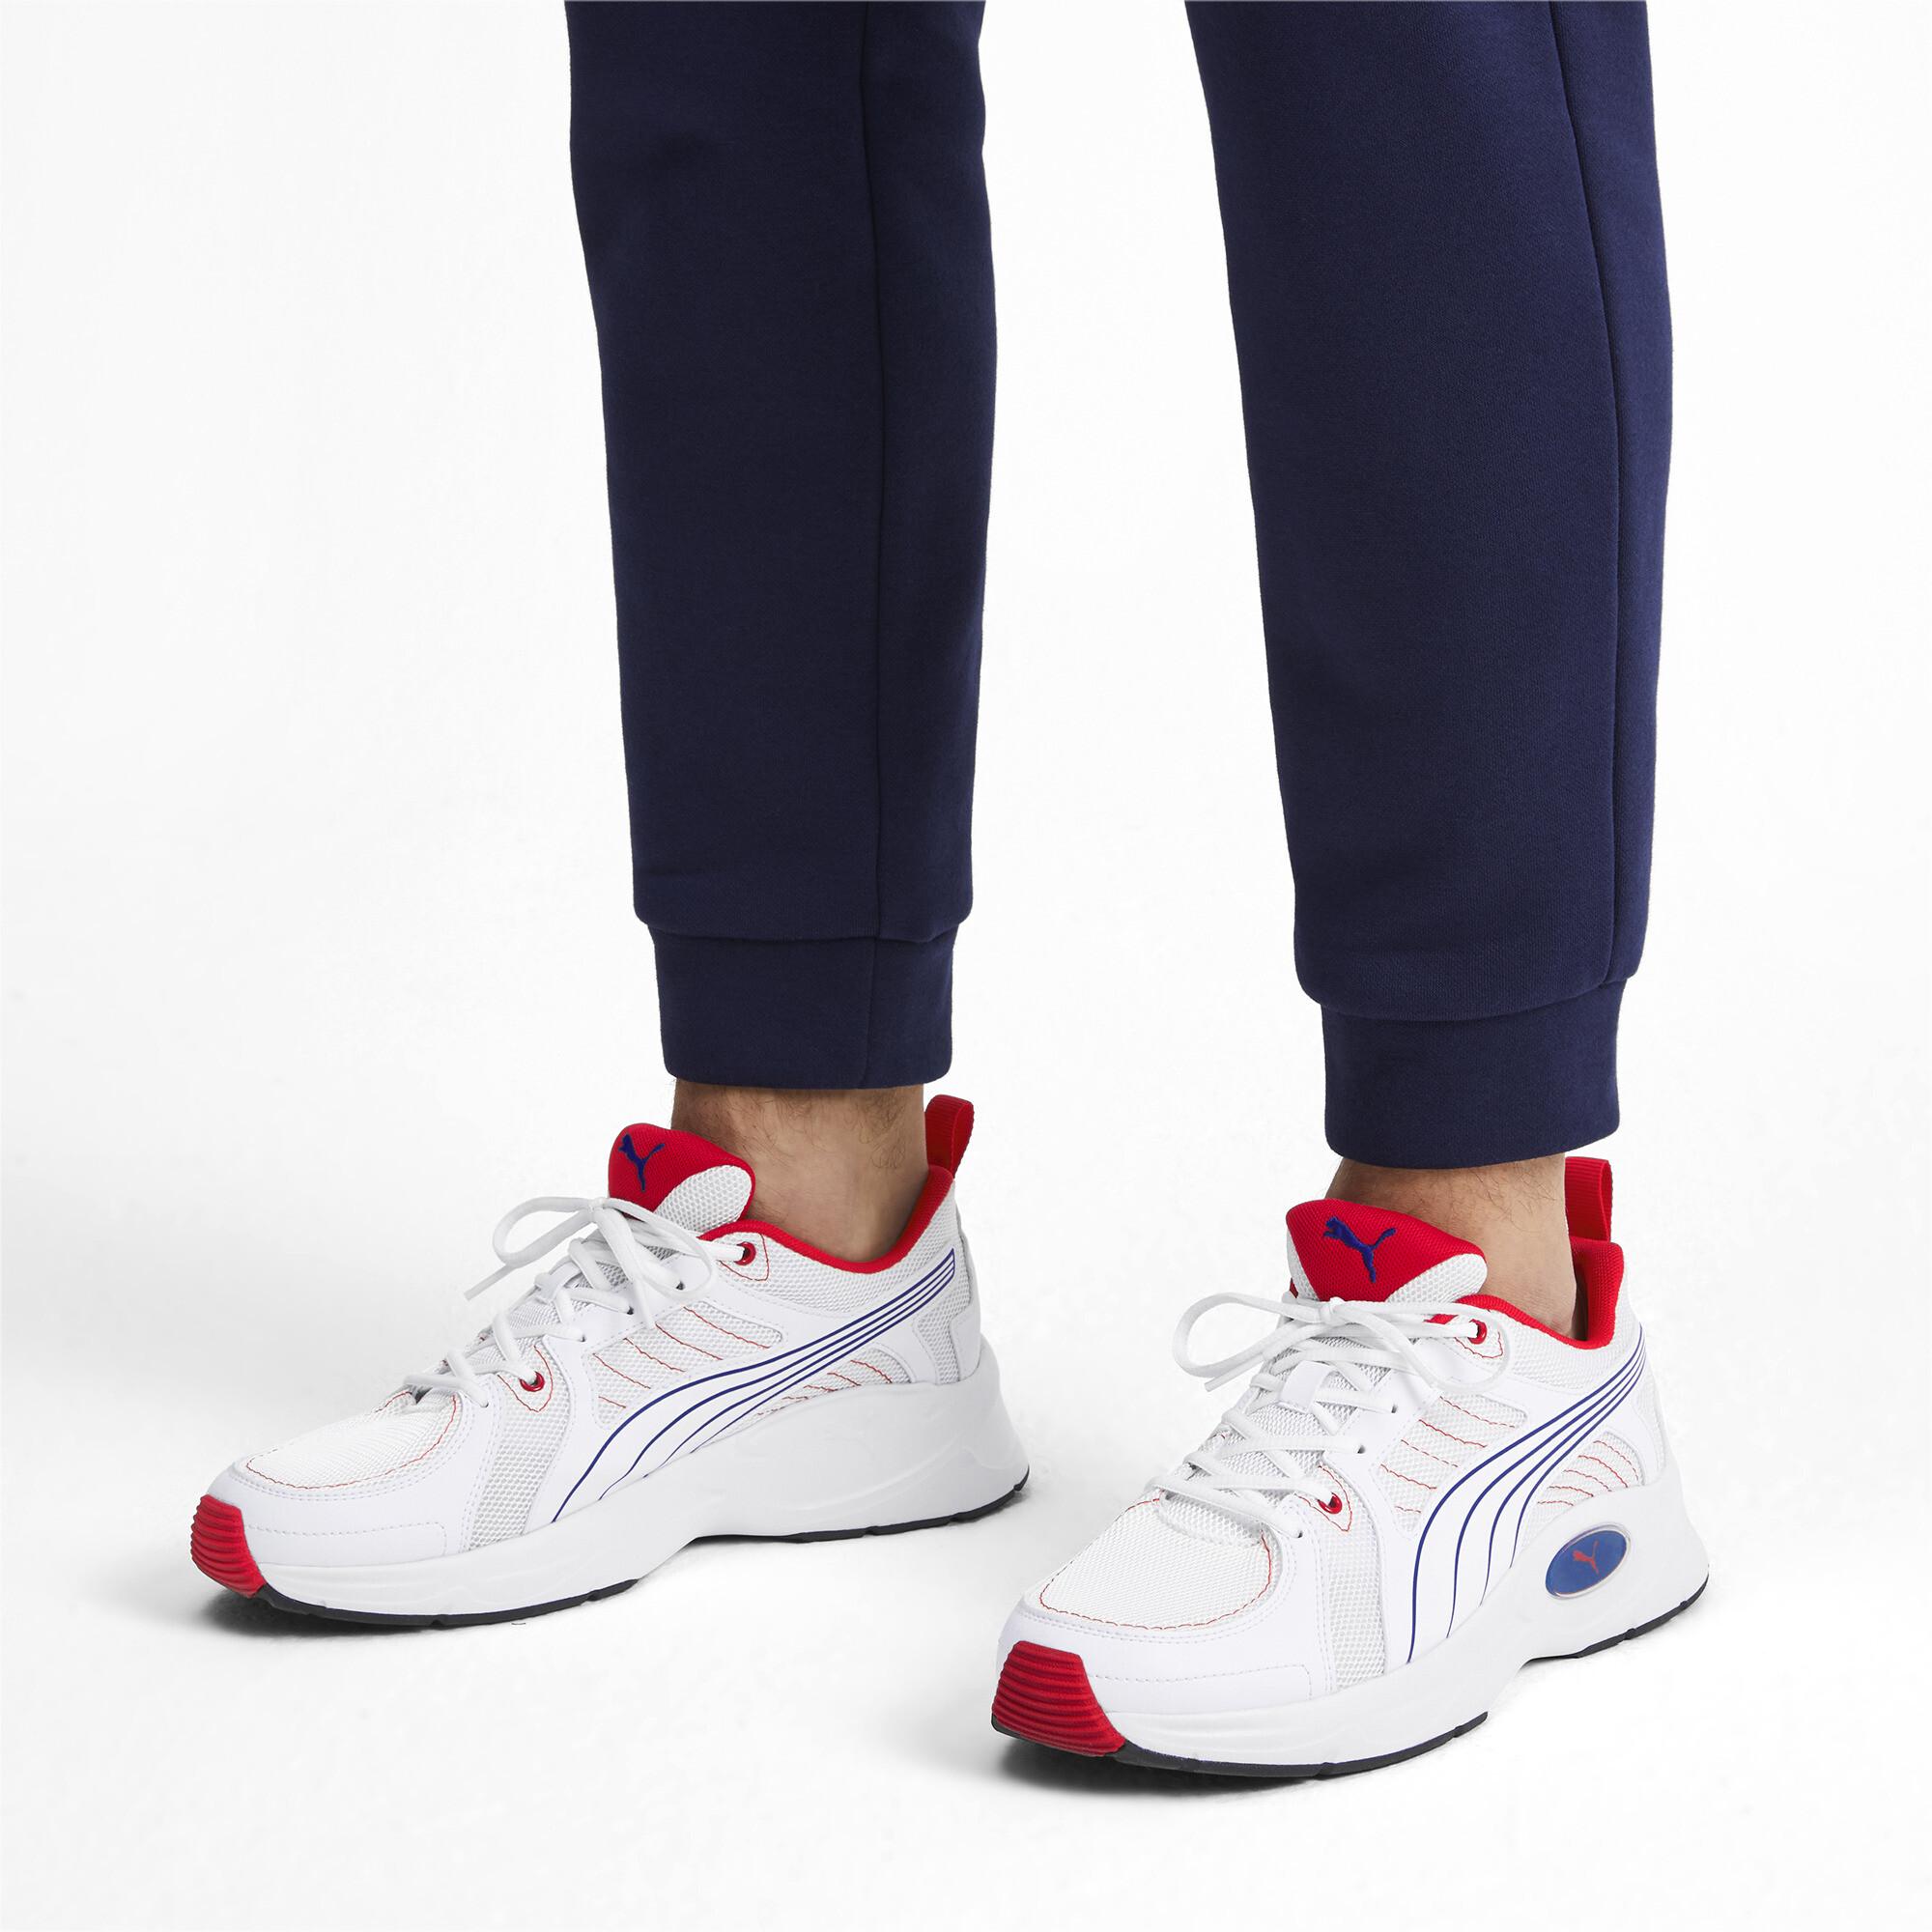 Details zu PUMA Nucleus Run Trainingsschuhe Unisex Schuhe Basics Neu